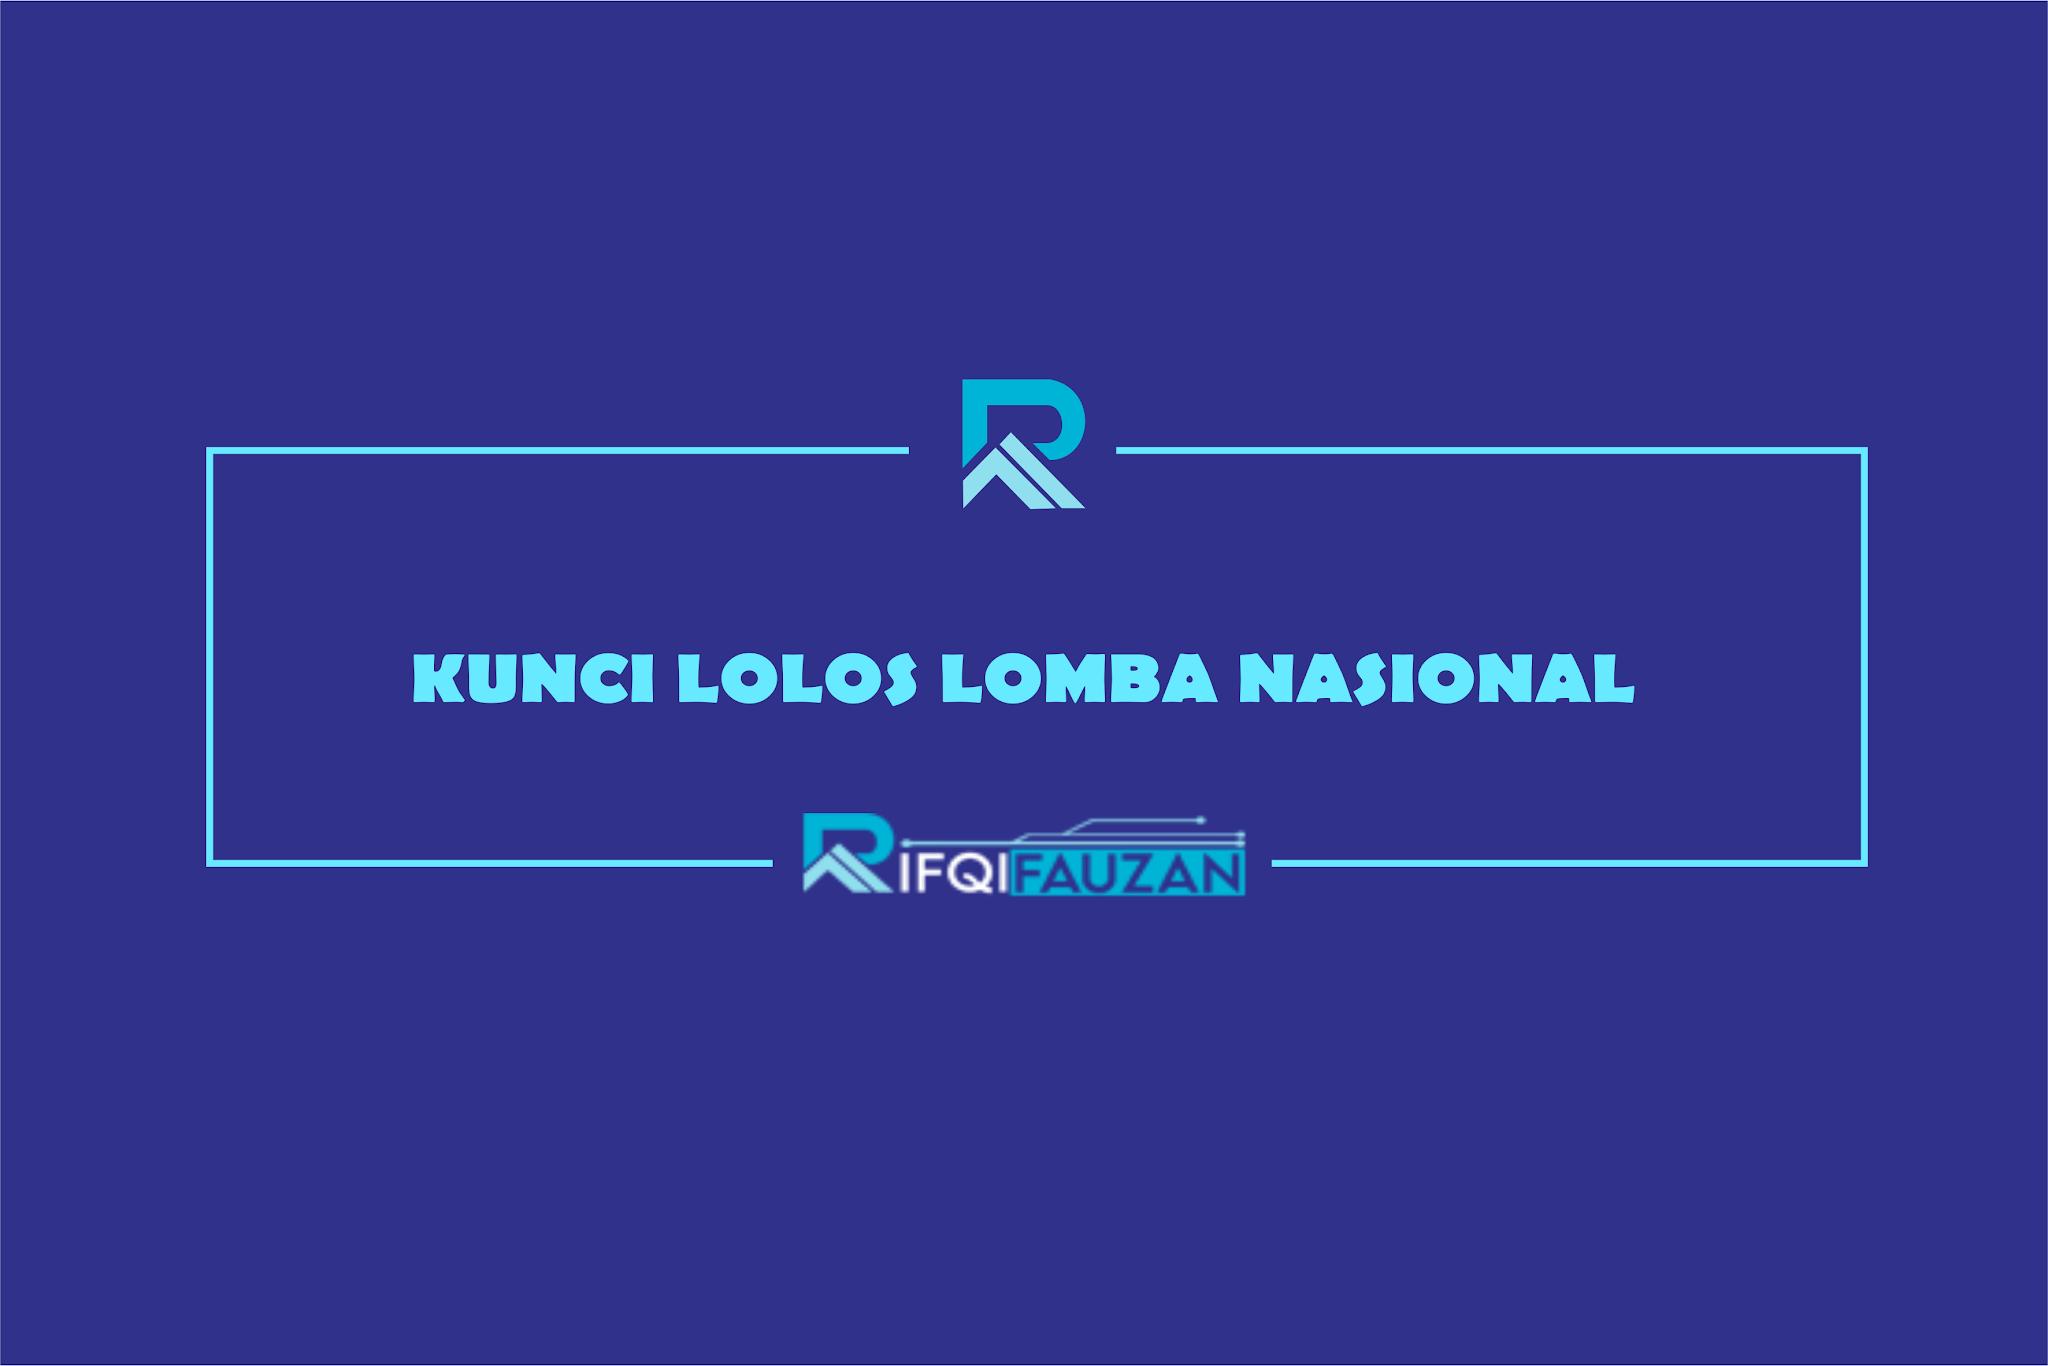 KUNCI SERING LOLOS LOMBA MAHASISWA NASIONAL 2020